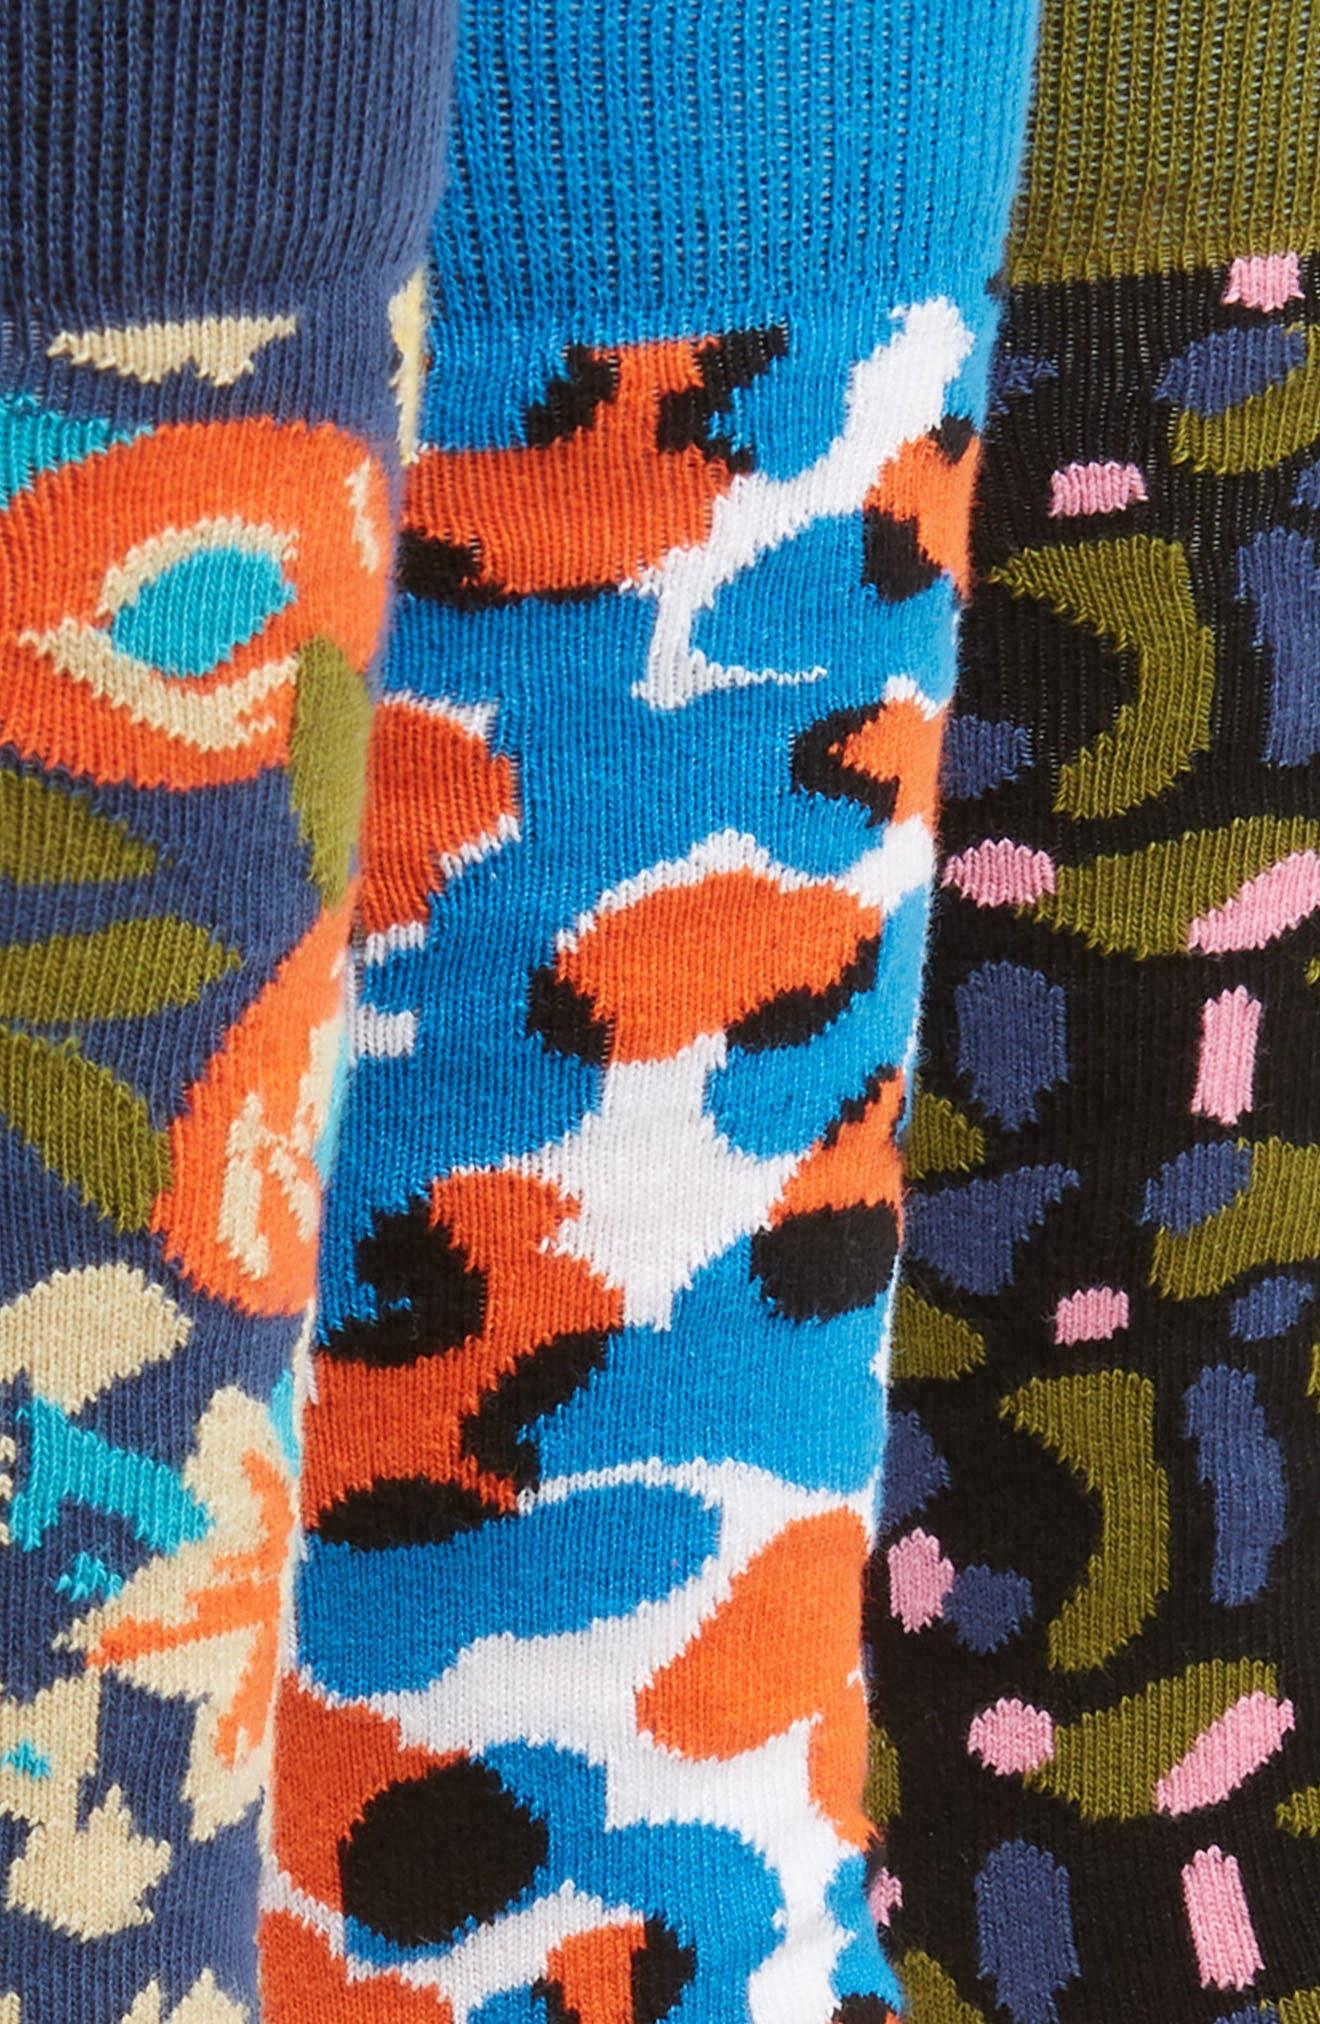 Wiz Khalifa 3-Pack Socks Boxed Set,                             Alternate thumbnail 2, color,                             462